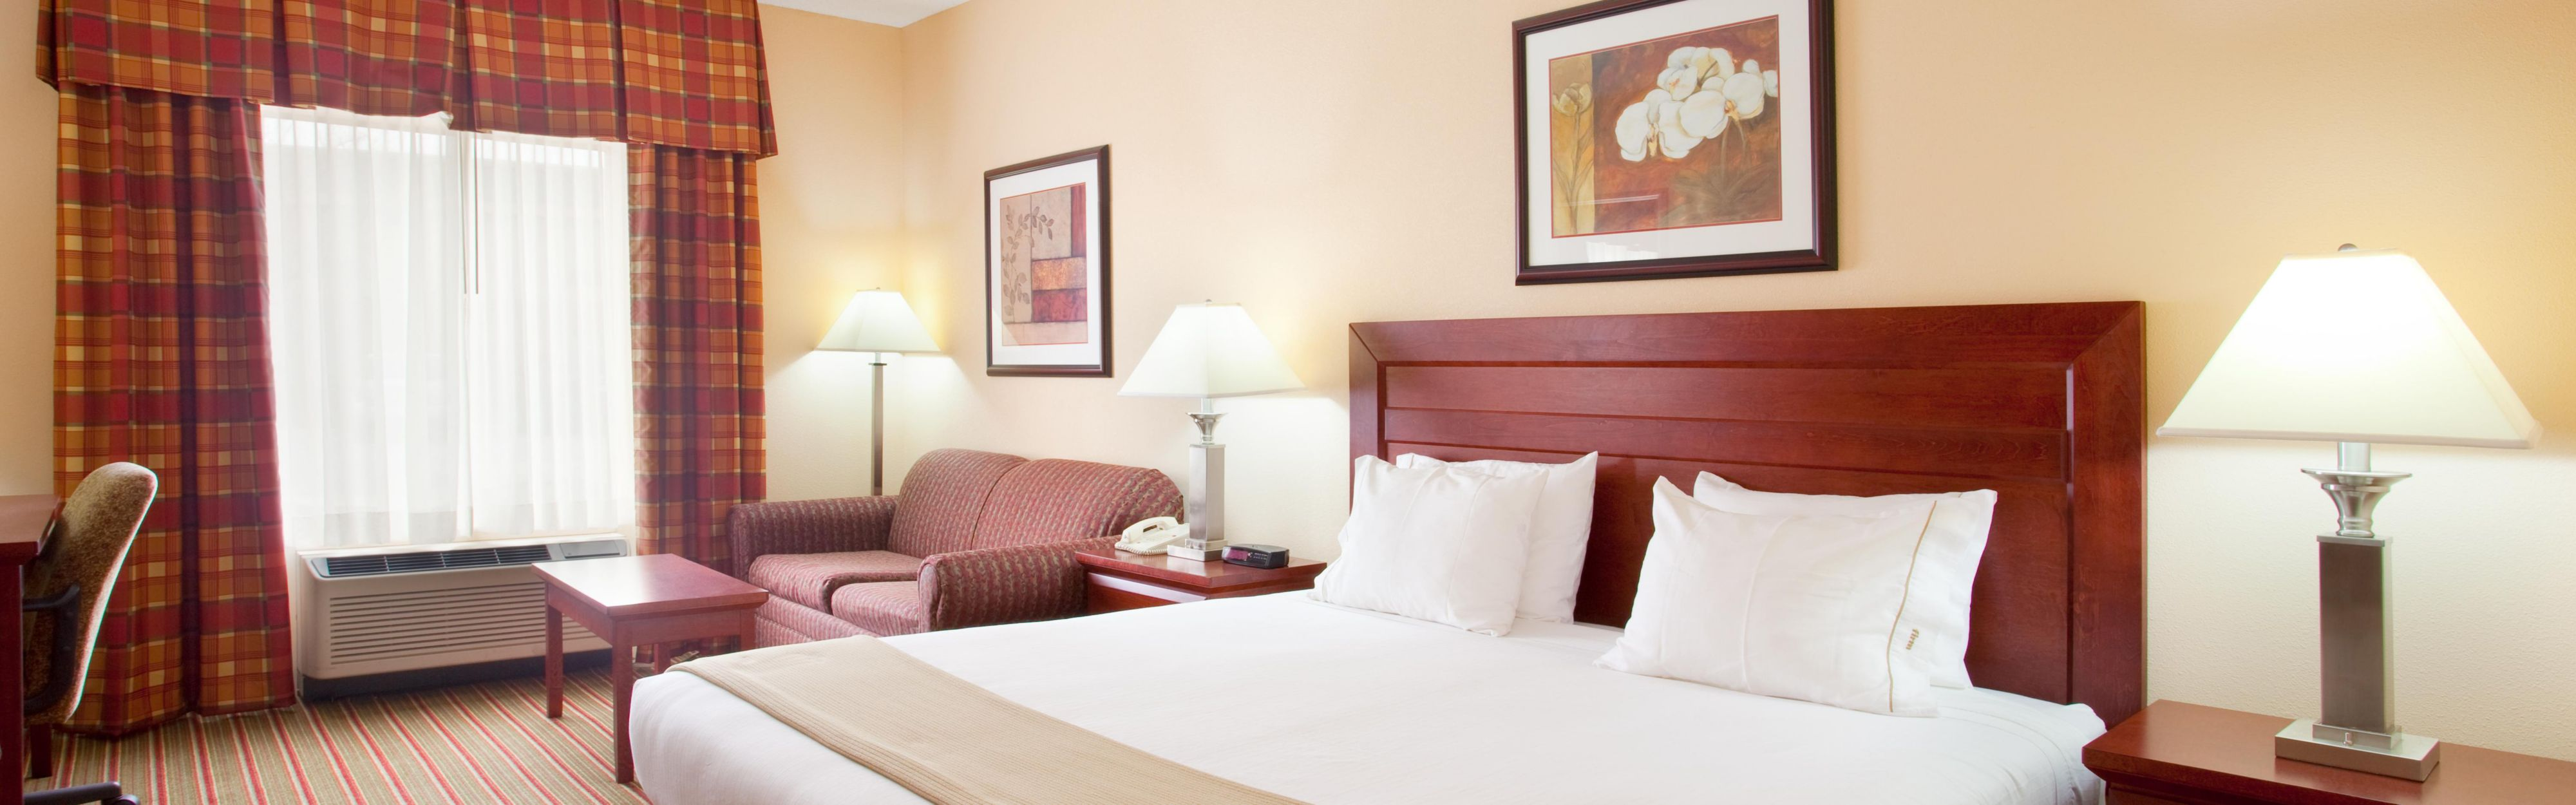 Holiday Inn Express & Suites Bourbonnais (Kankakee/Bradley) image 1